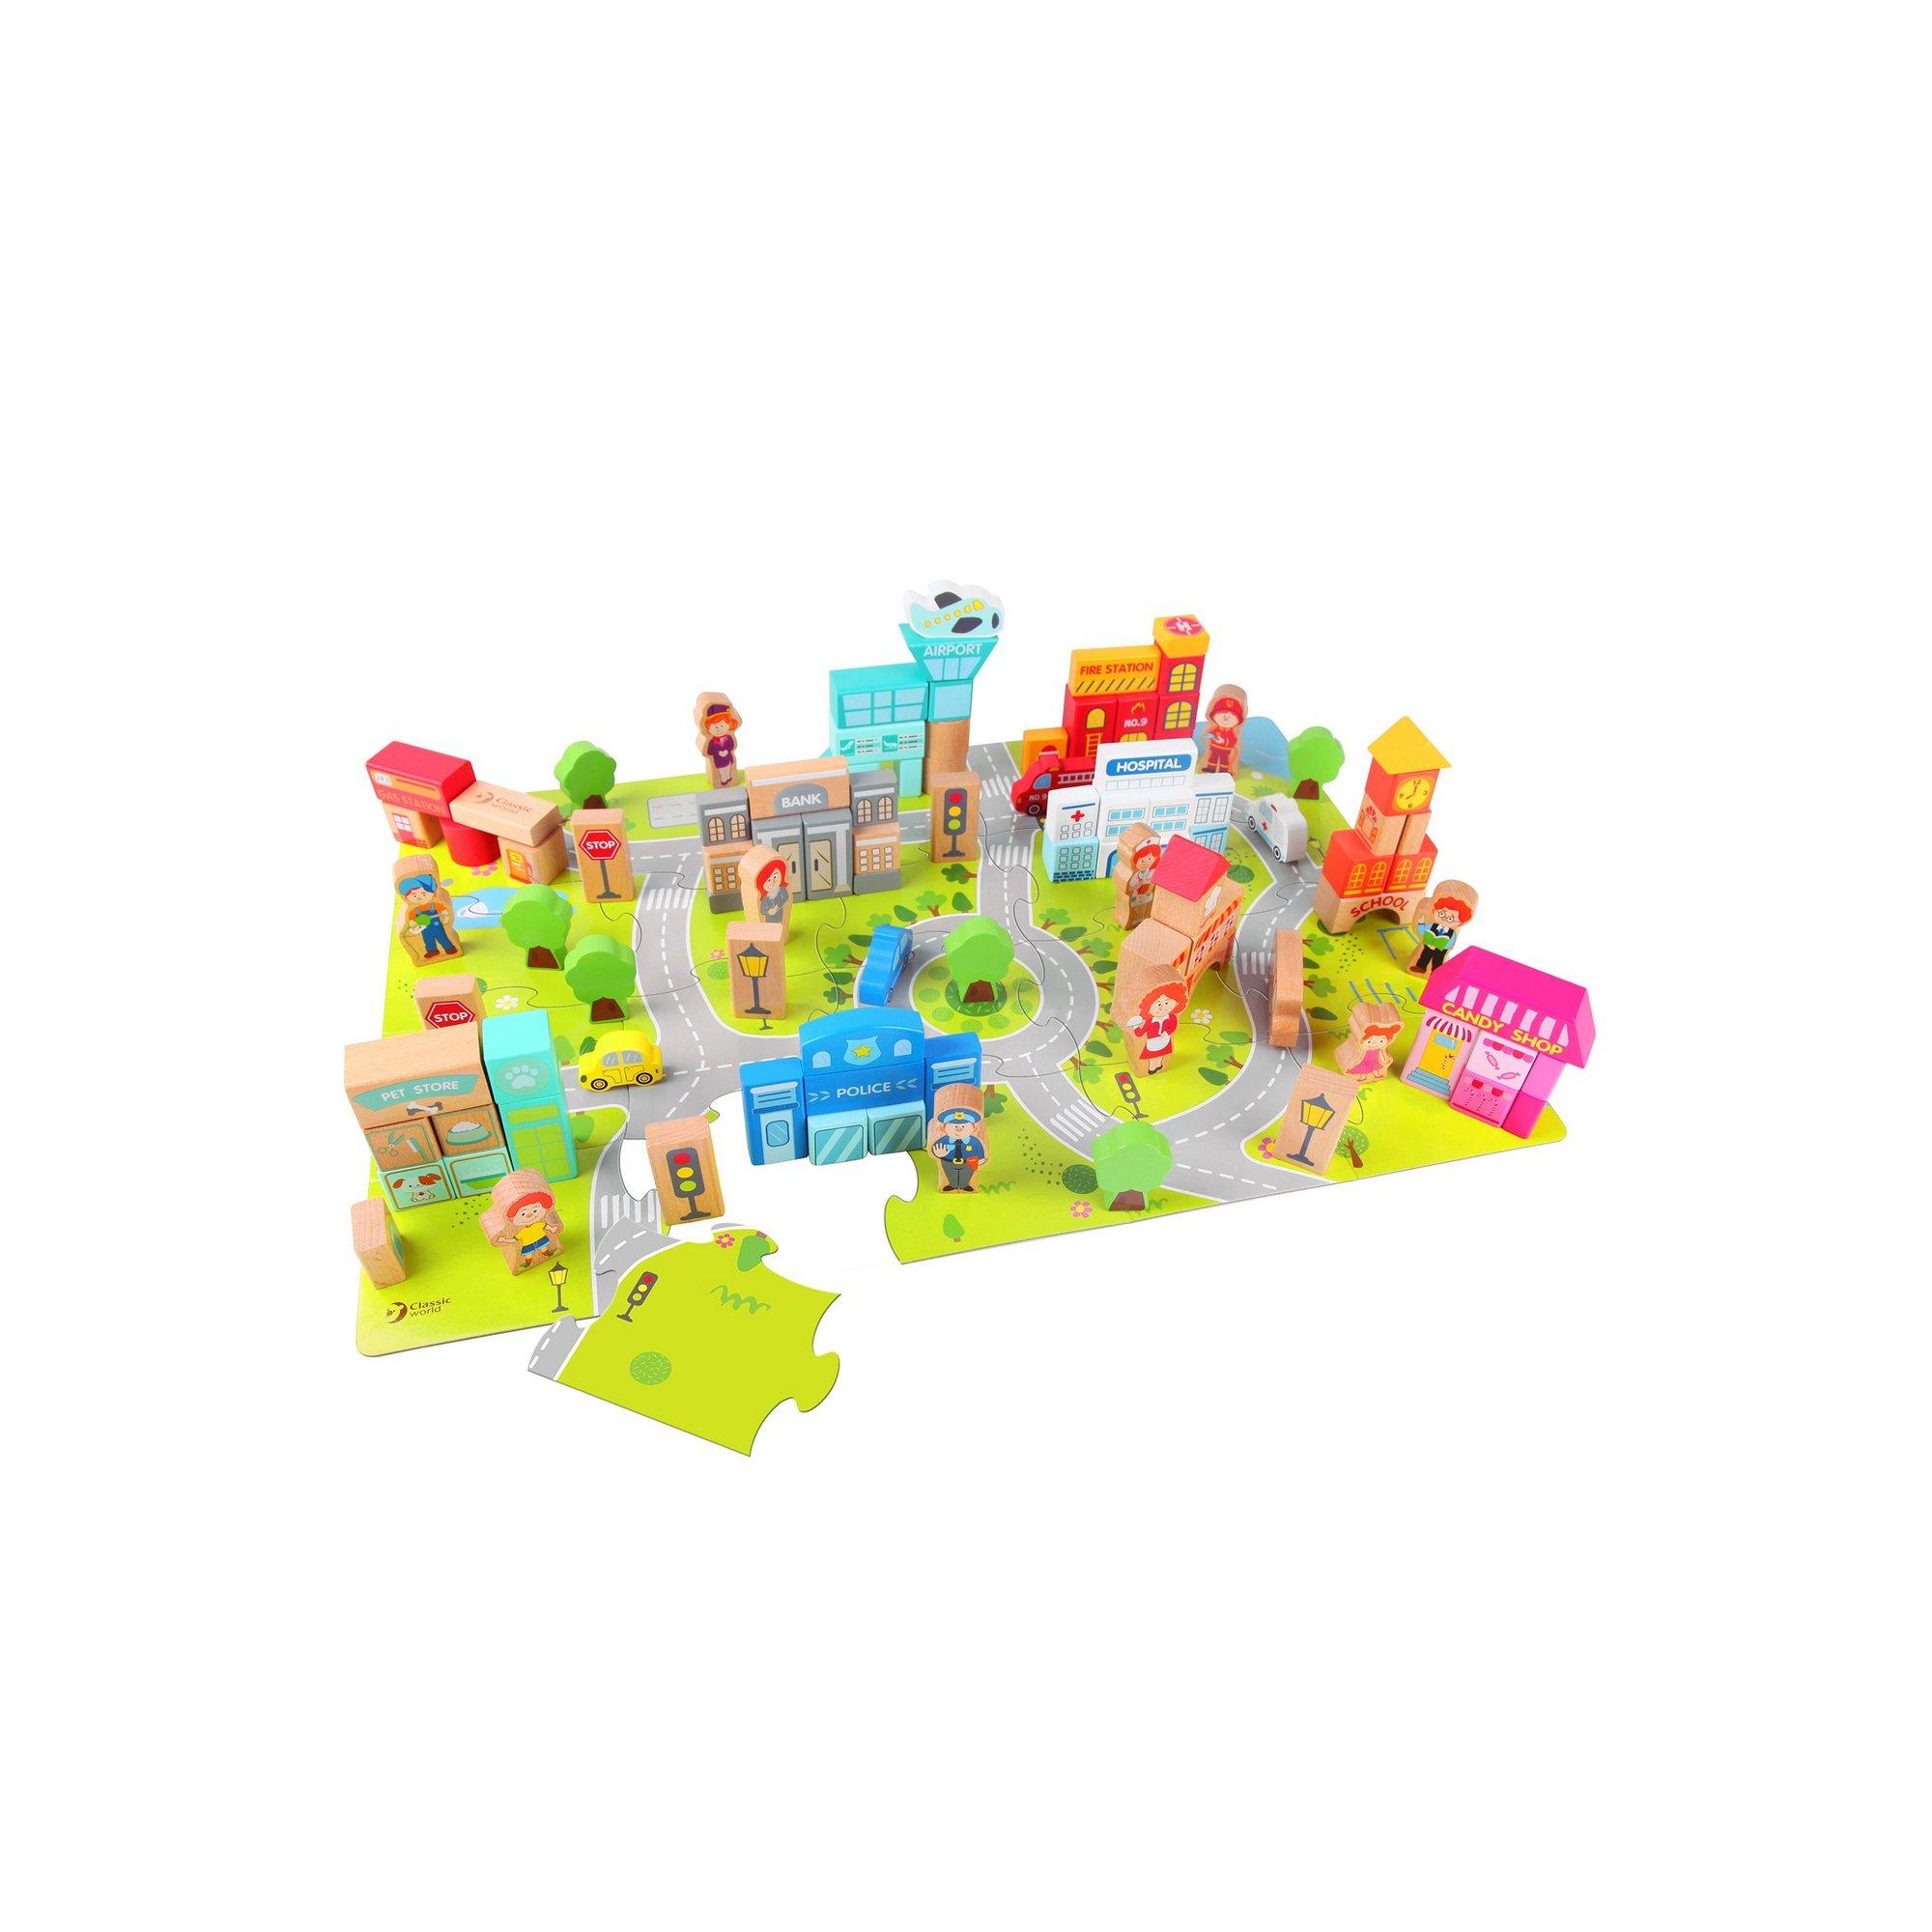 Image of Classic World - City Building Blocks